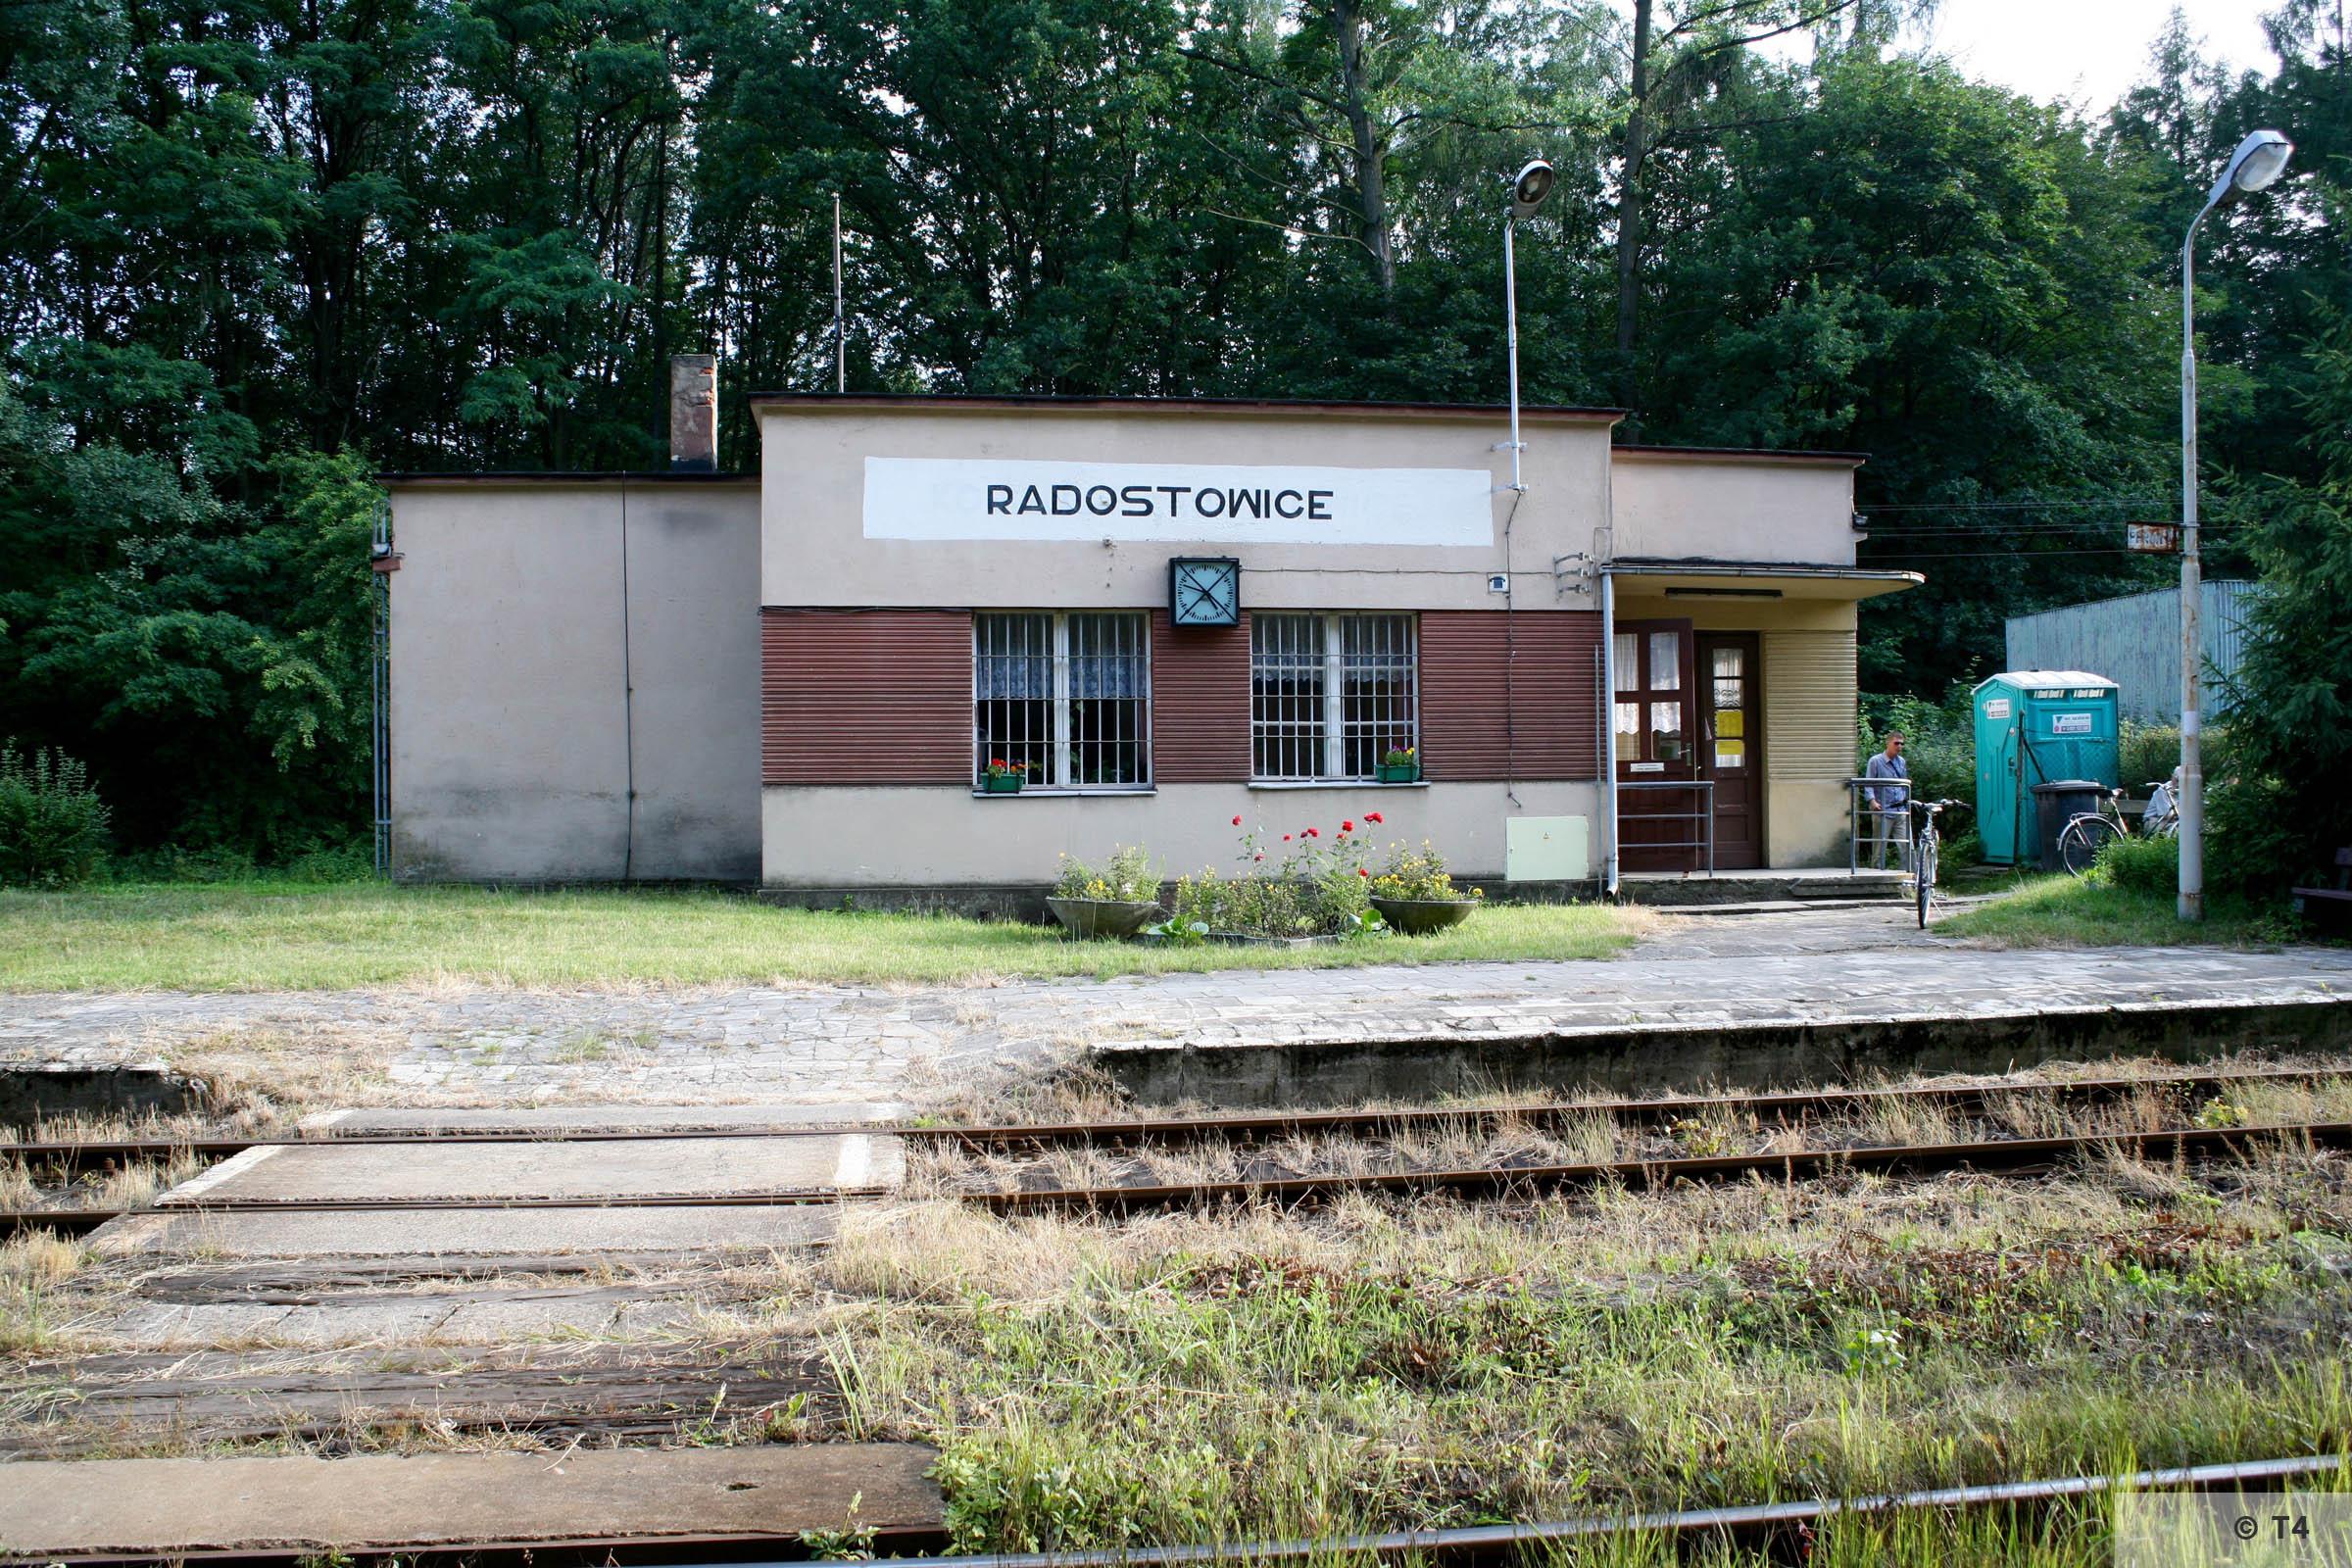 Radostowice railway station. 2007 T4 8995